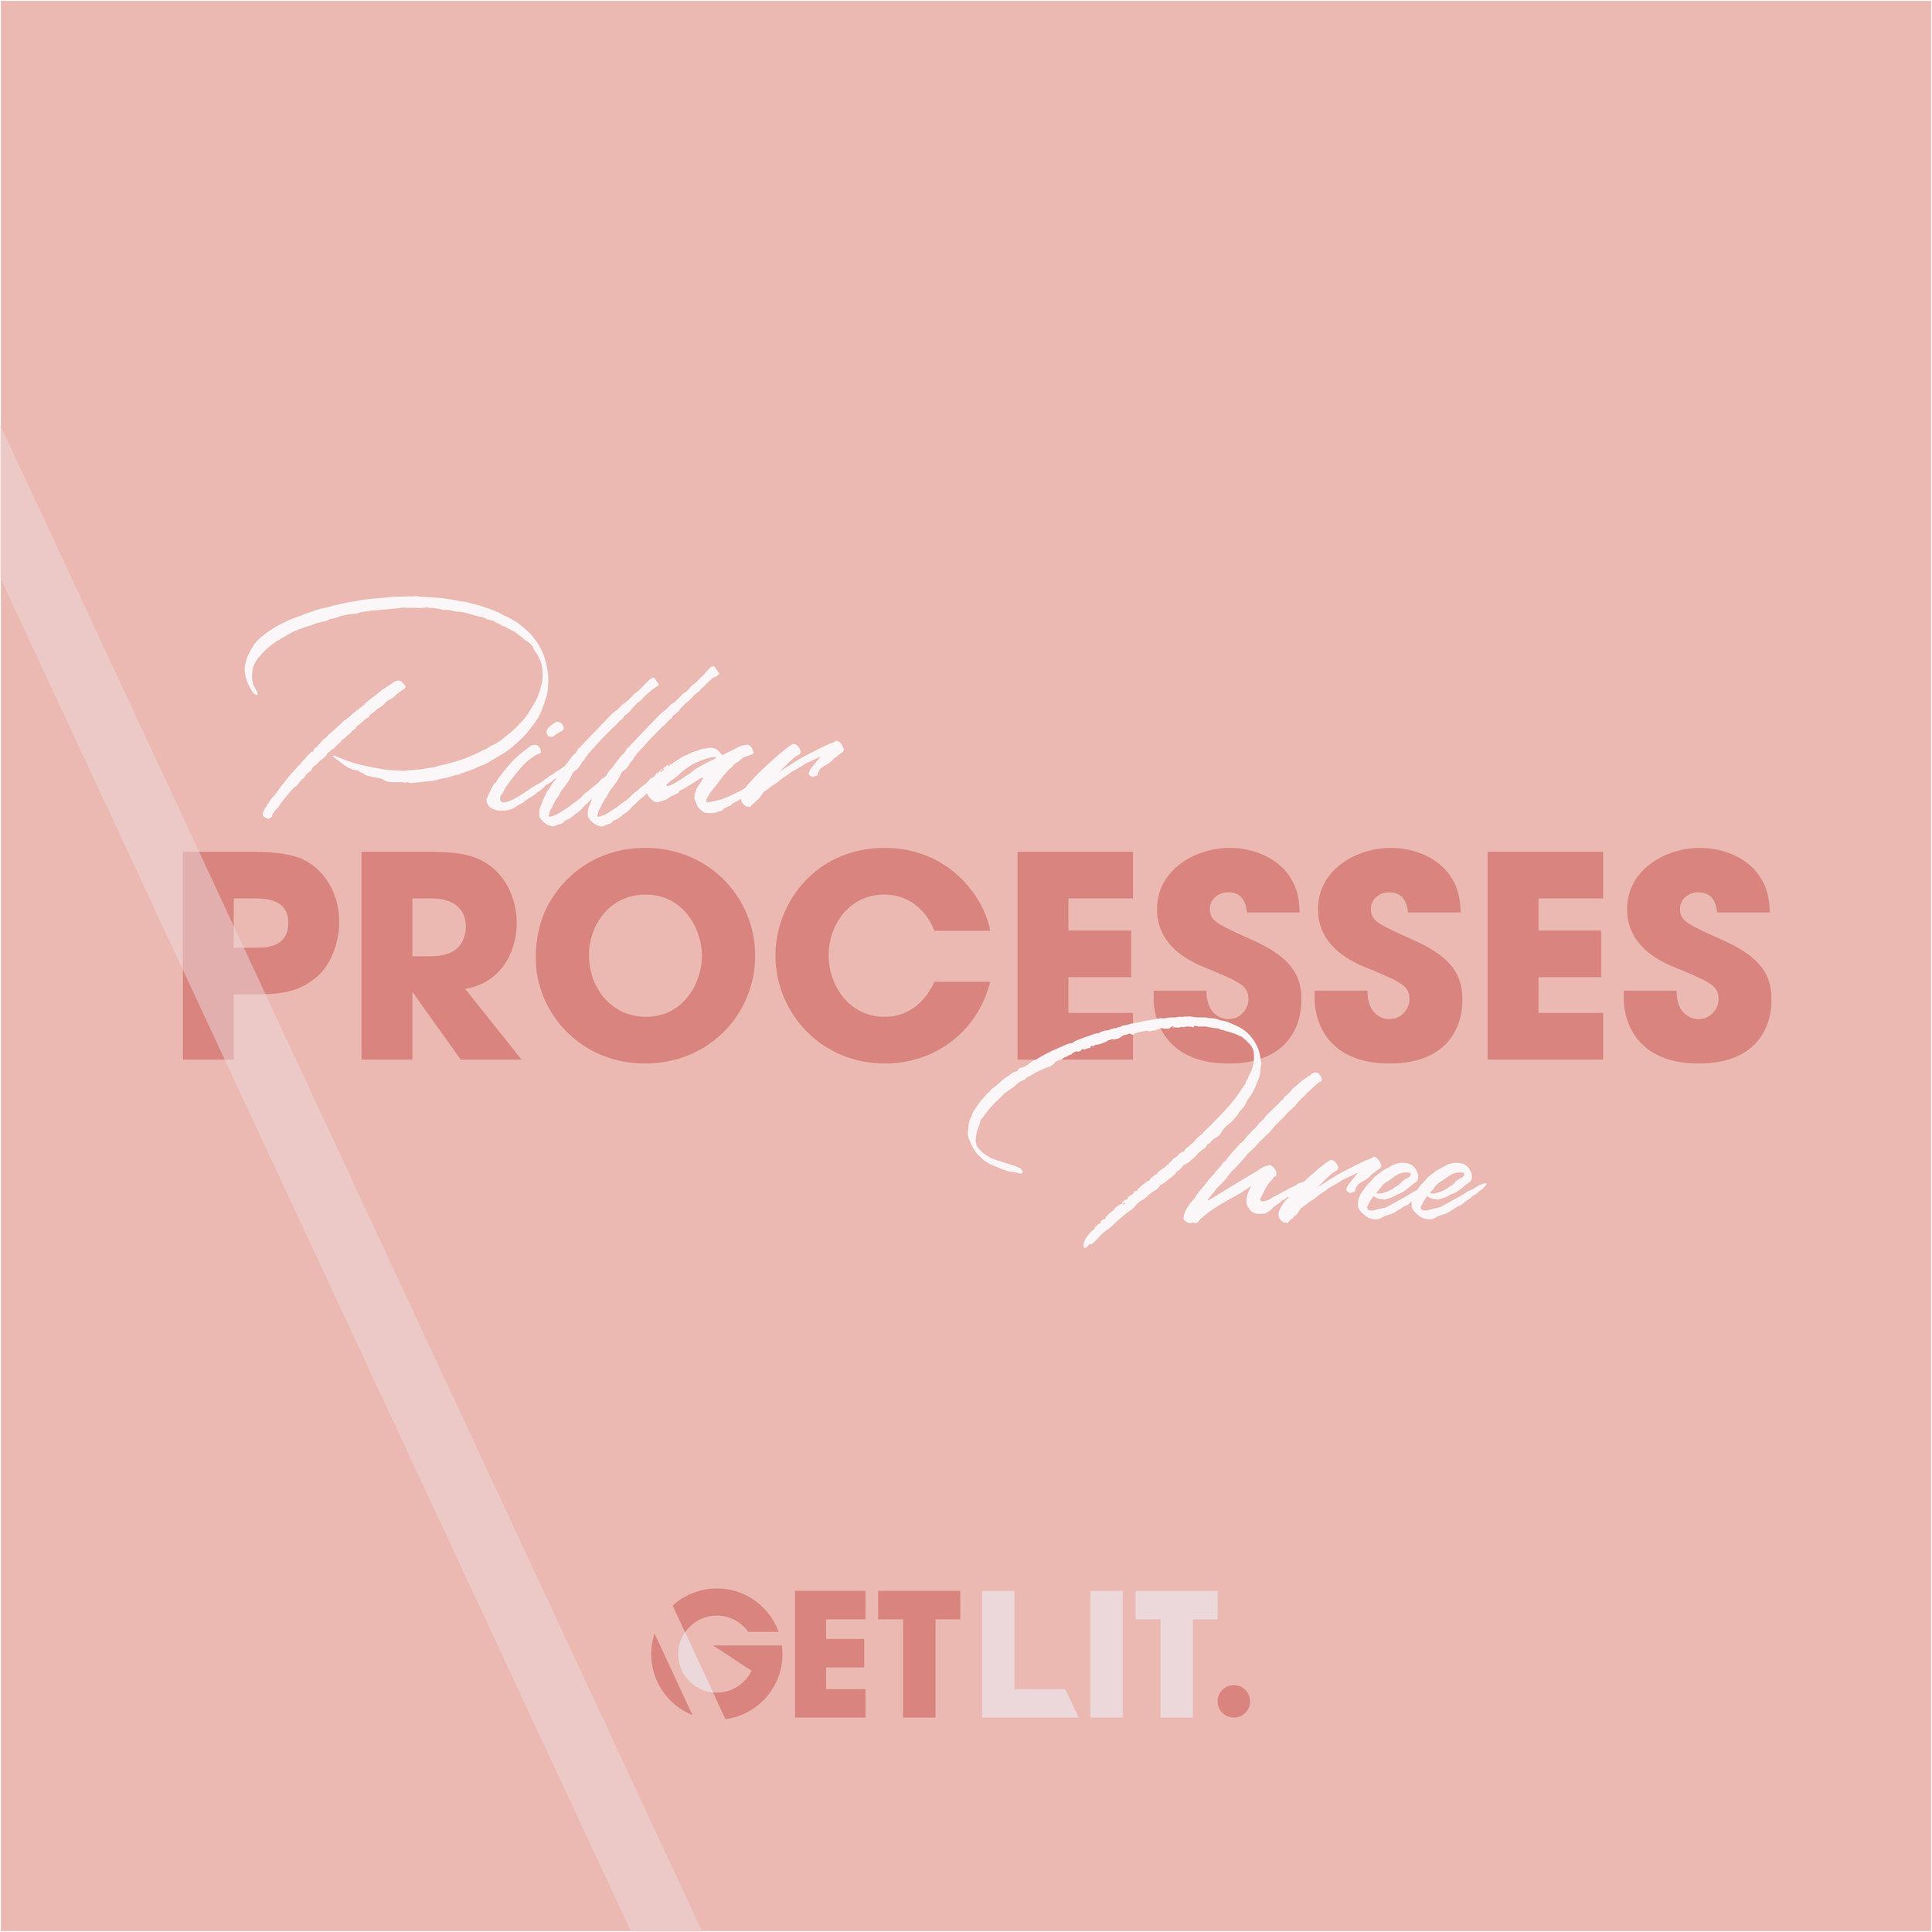 7 P TO SUCCESS PILLARS3.jpg